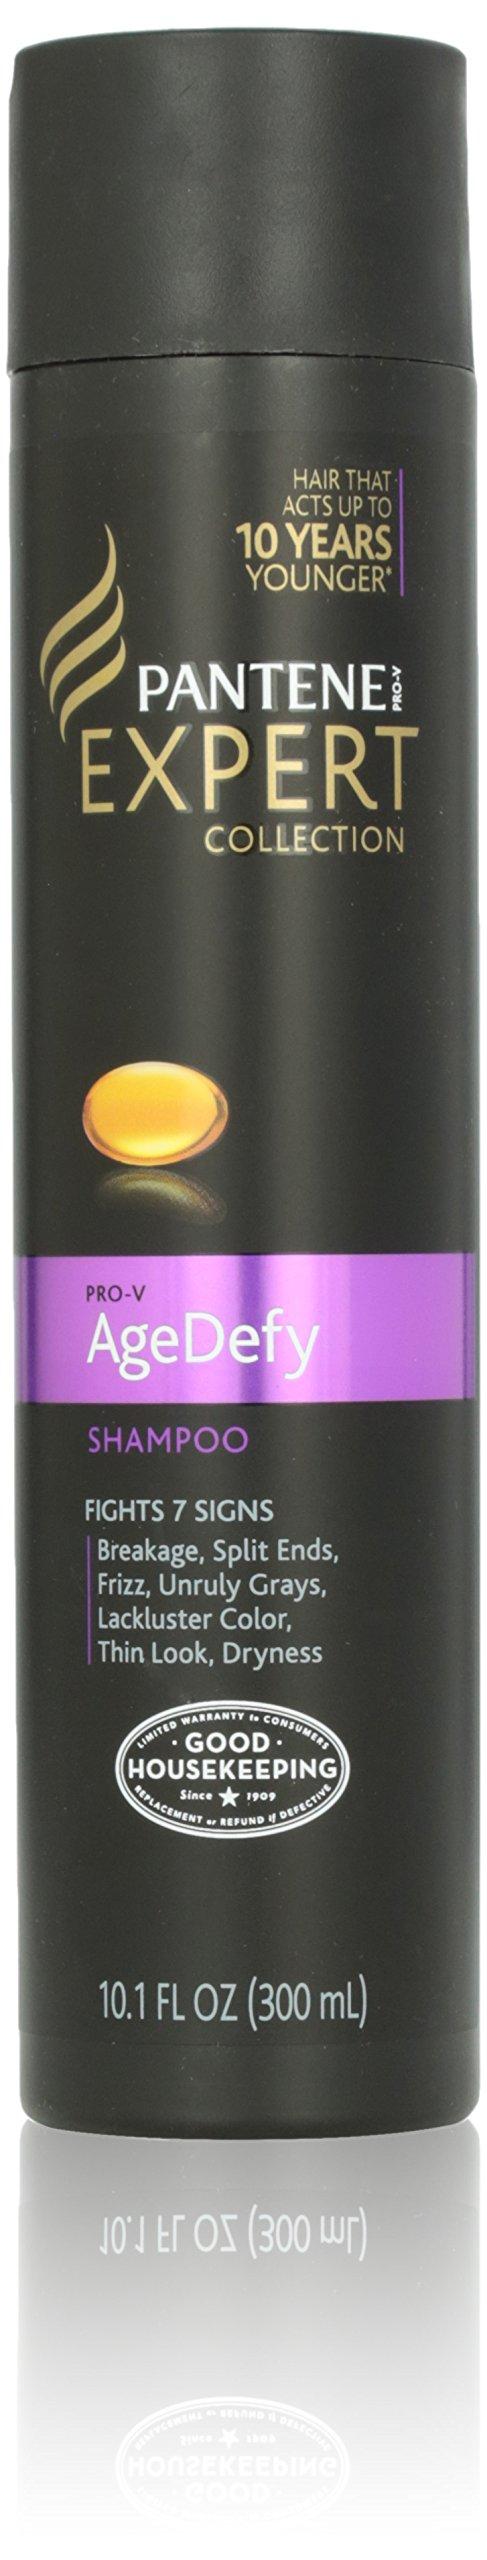 Pantene Pro-V Expert Collection Agedefy Shampoo, 10.1 FL OZ by Pantene